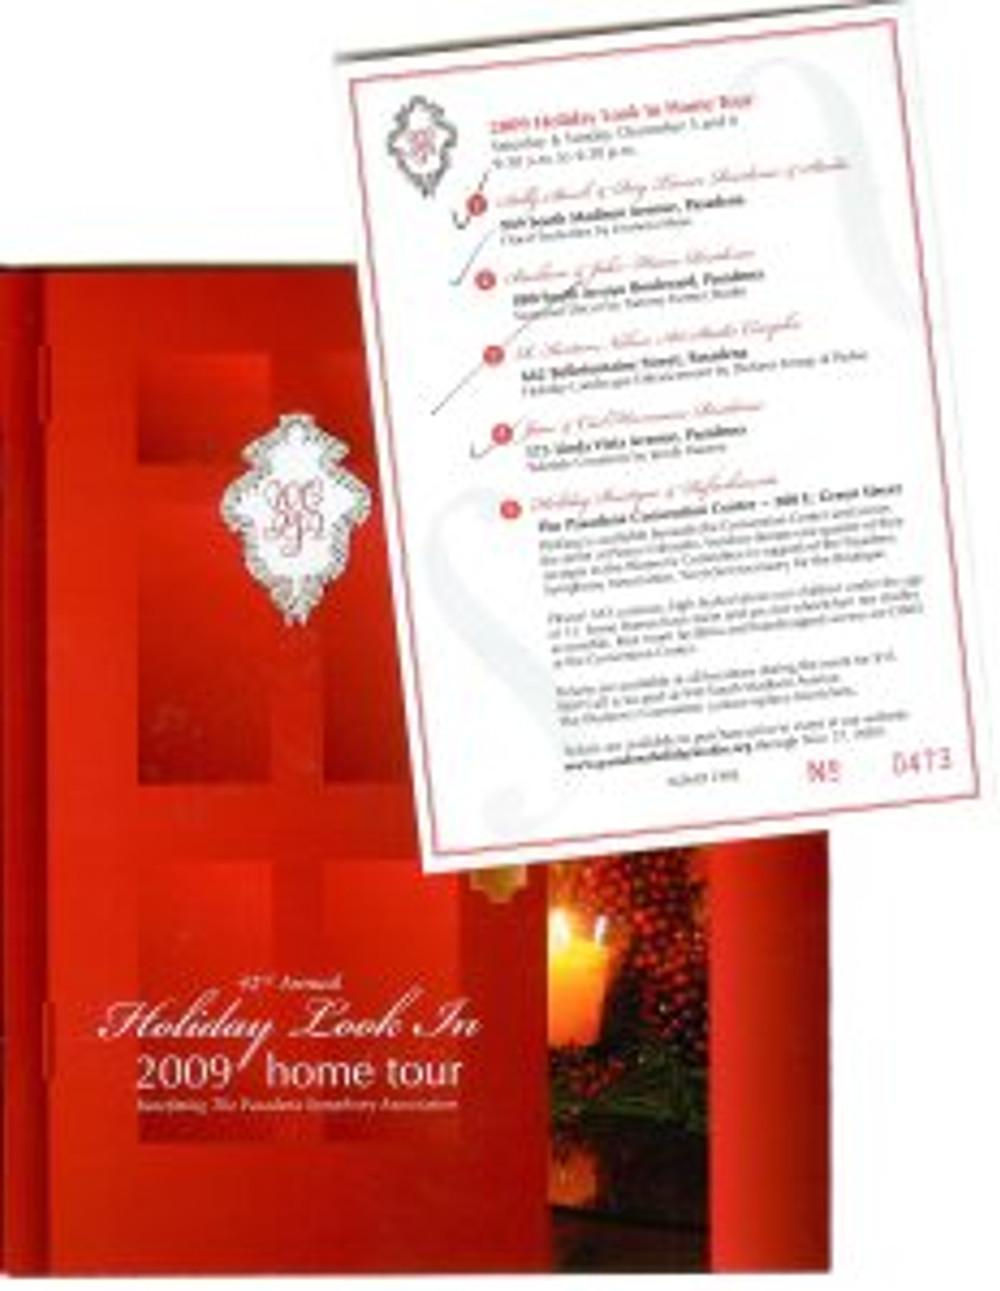 Home Tour Program and Ticket